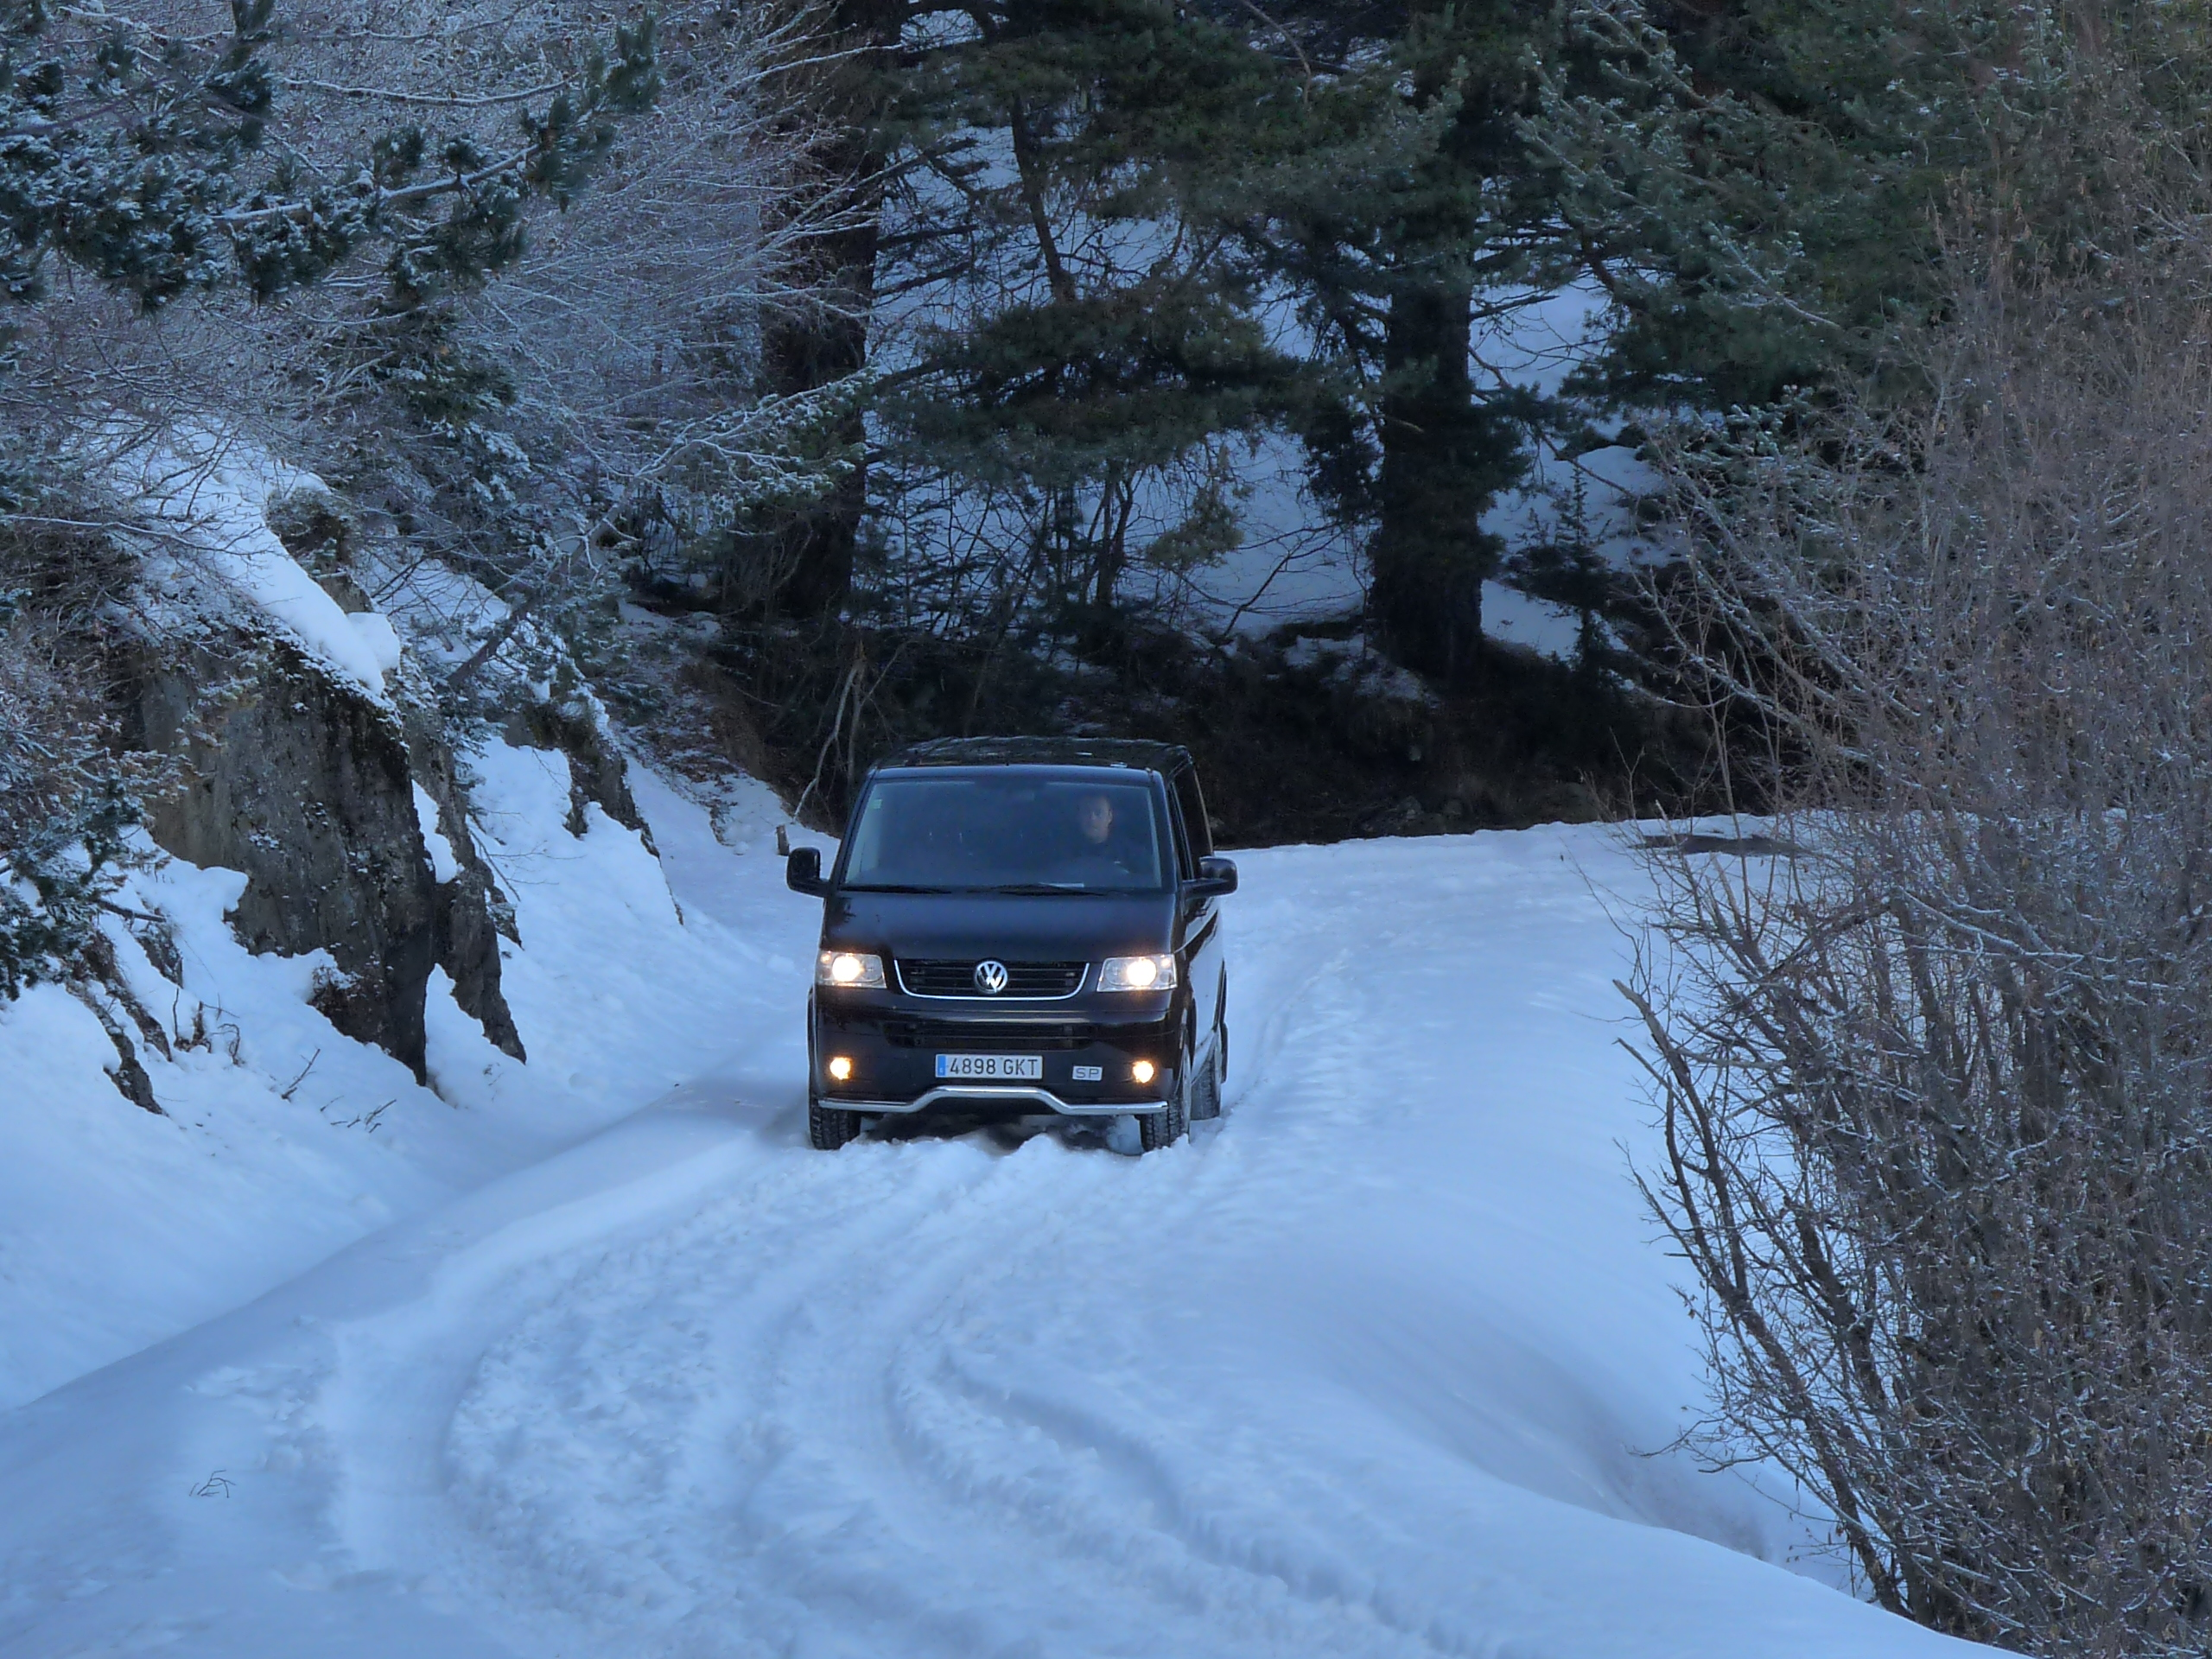 Llega la nieve, también a la carretera.